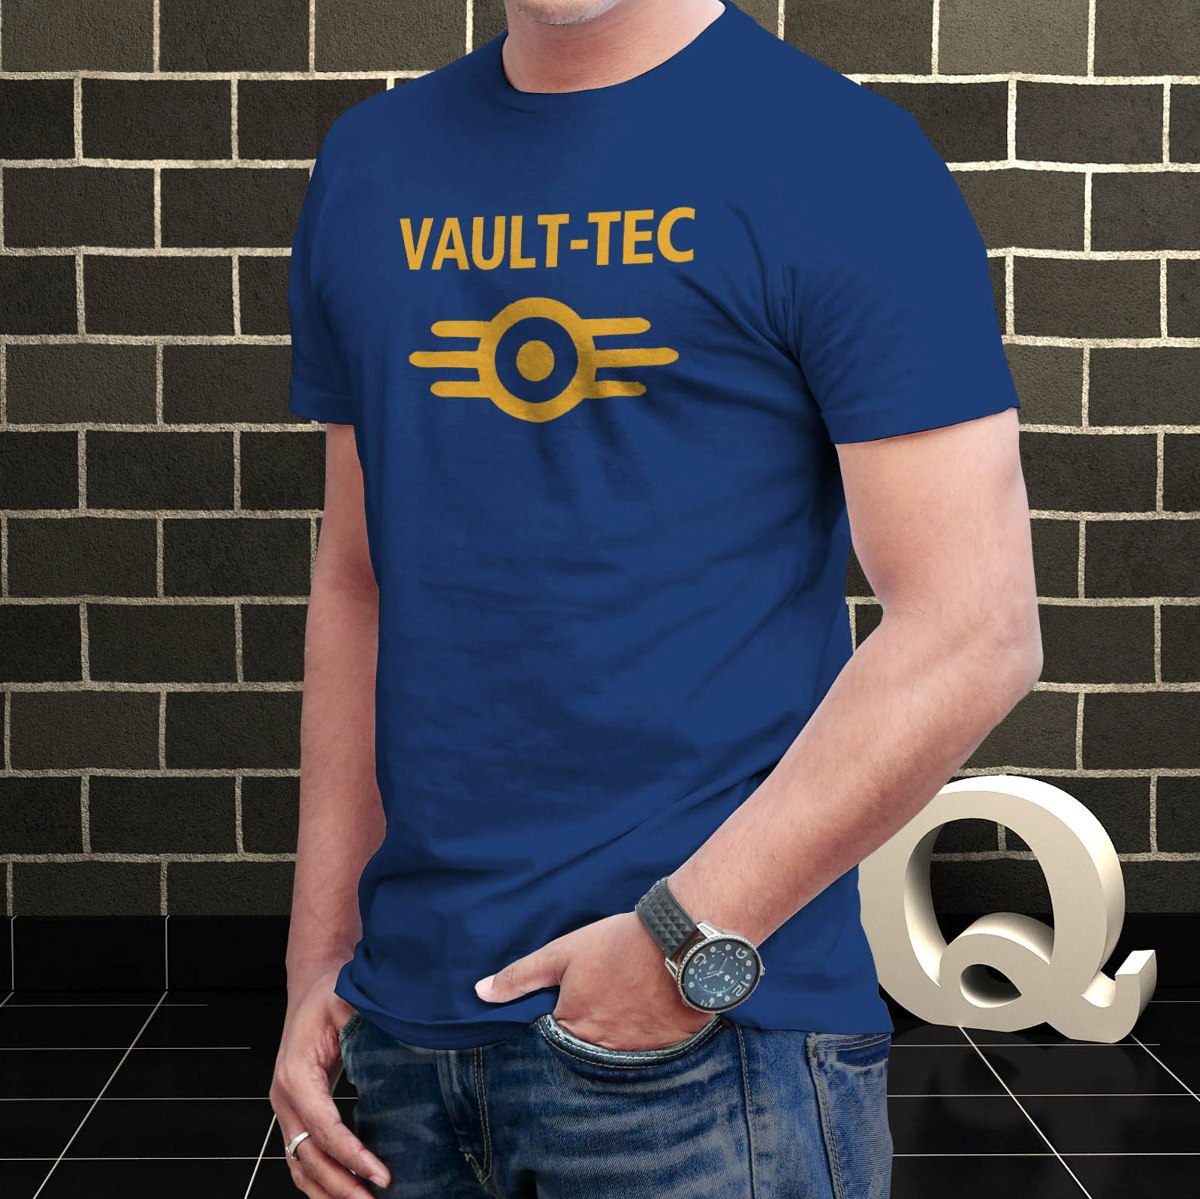 Remera Vc 100% Algodon - Fallout - Vault Tec -   749 b2b913161abee